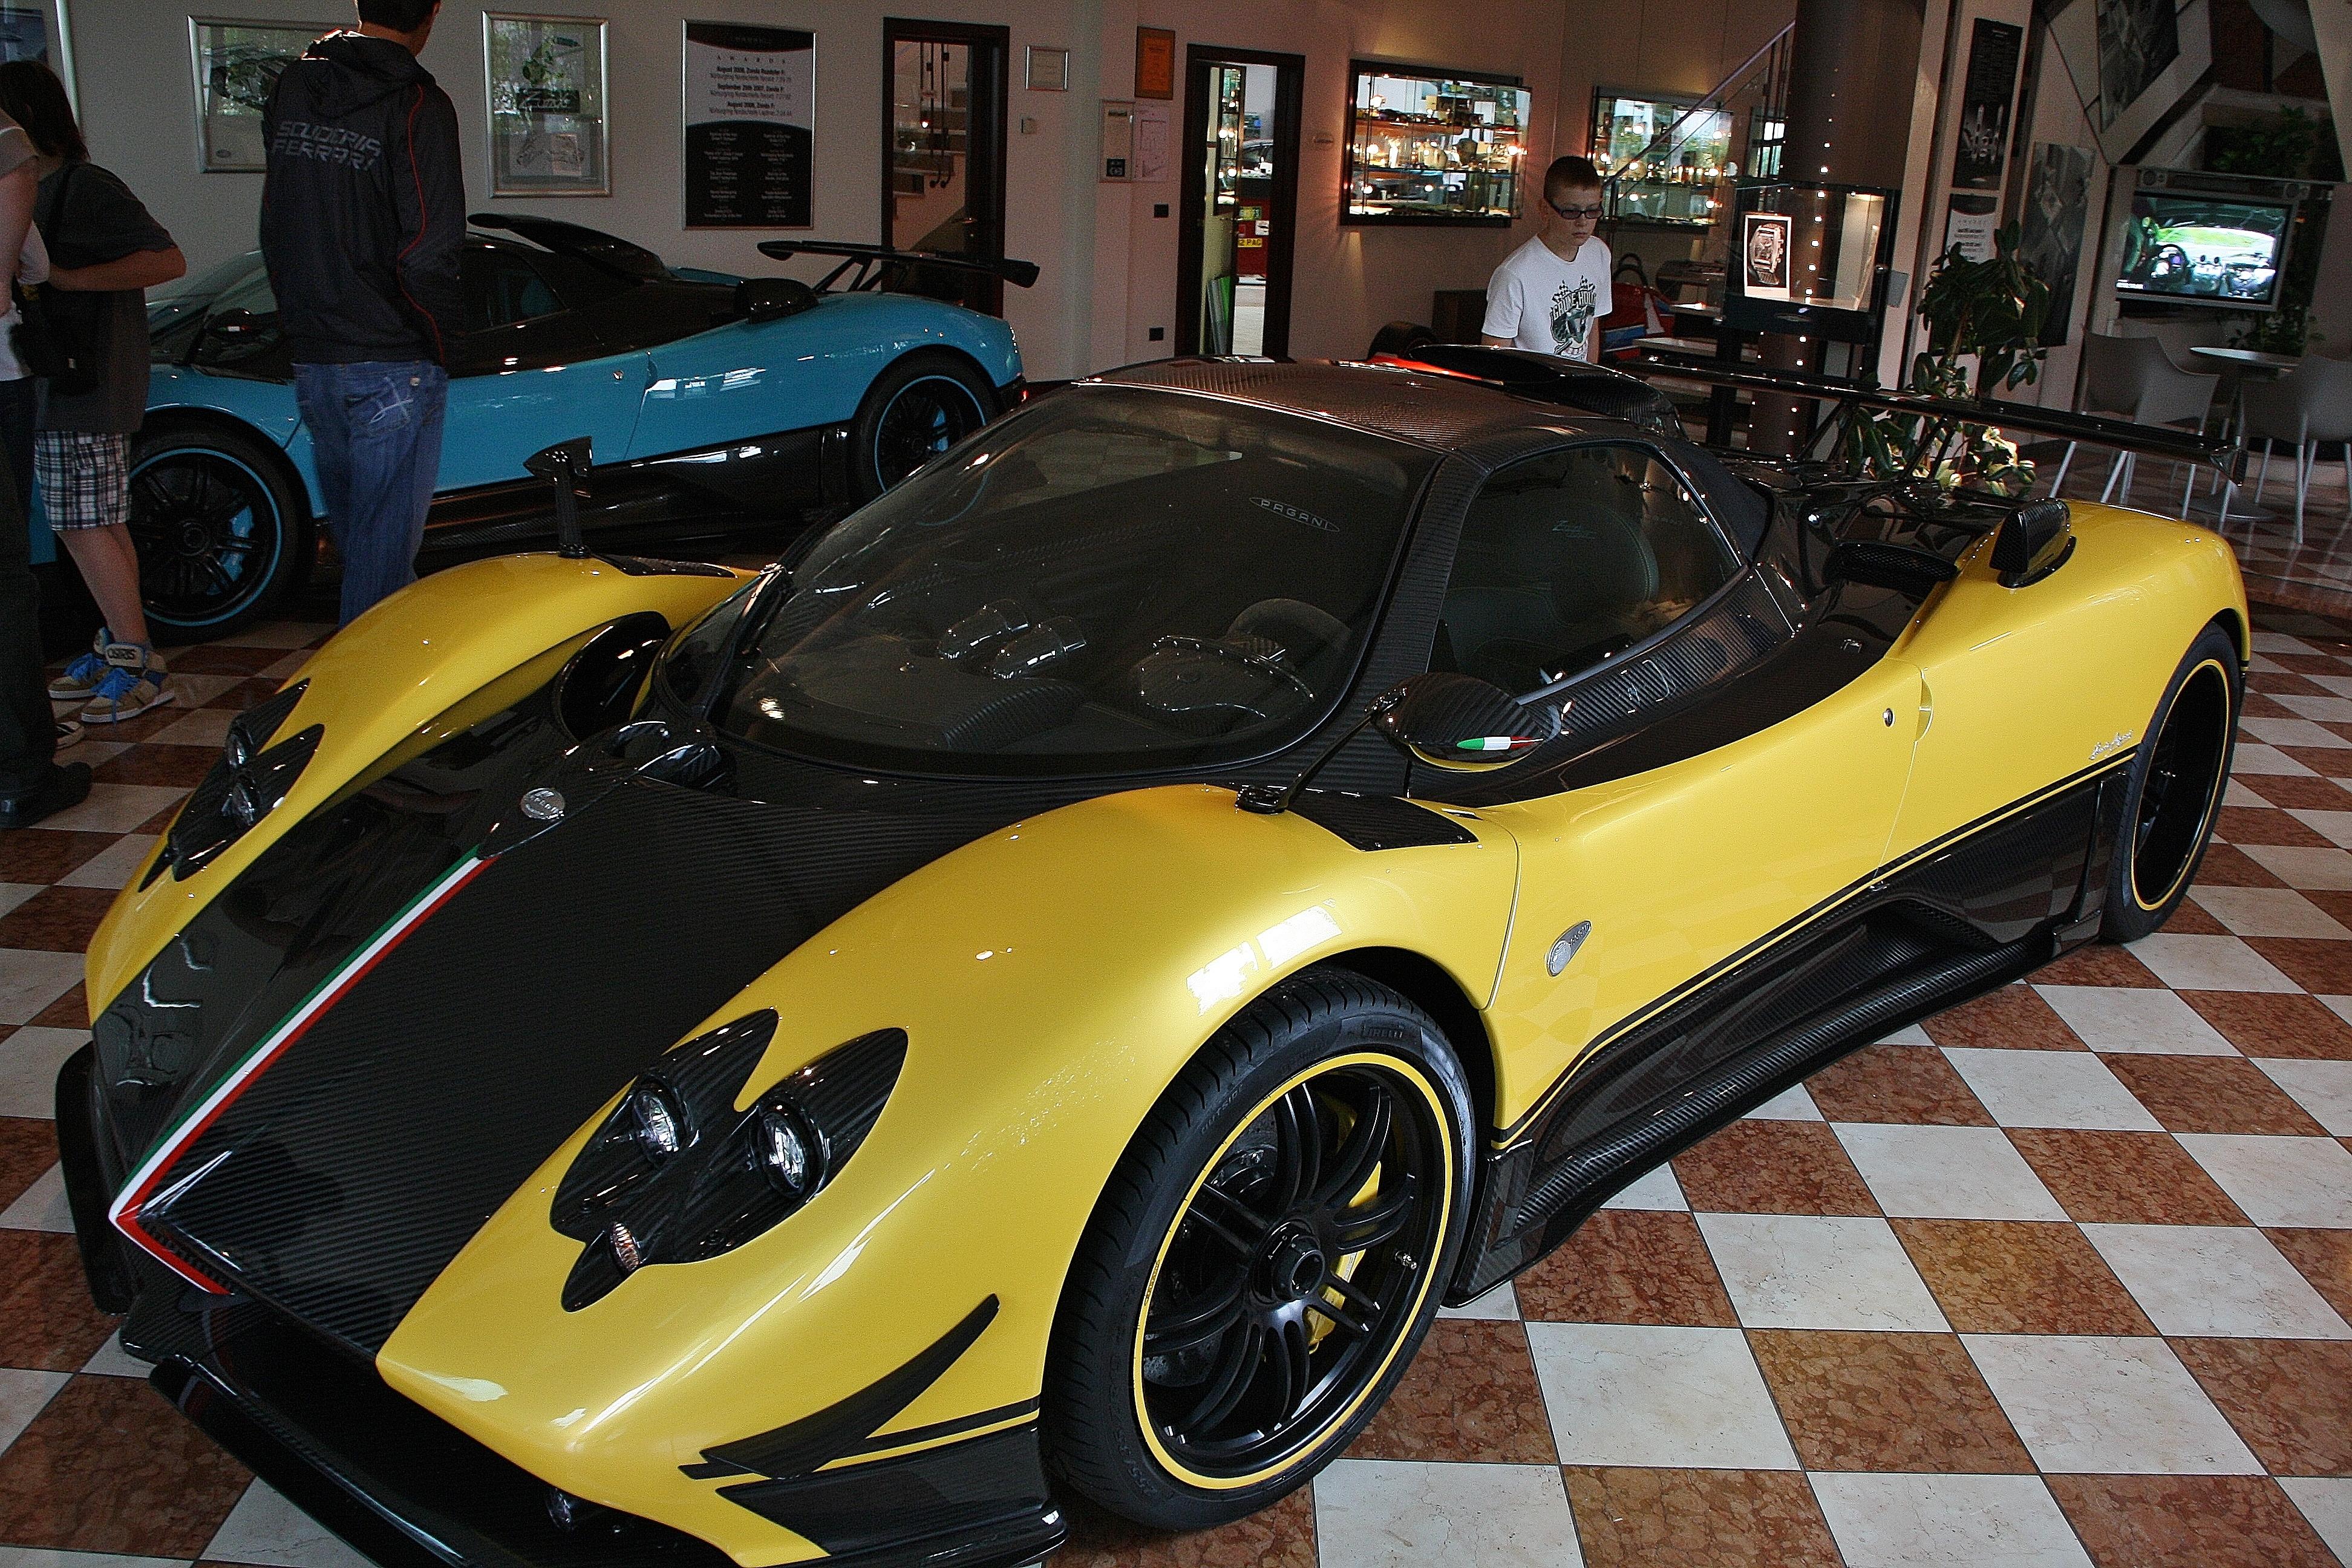 Pagani Zonda Cinque Roadster 76114 4 Page 2 Forum Pagani Zonda Net